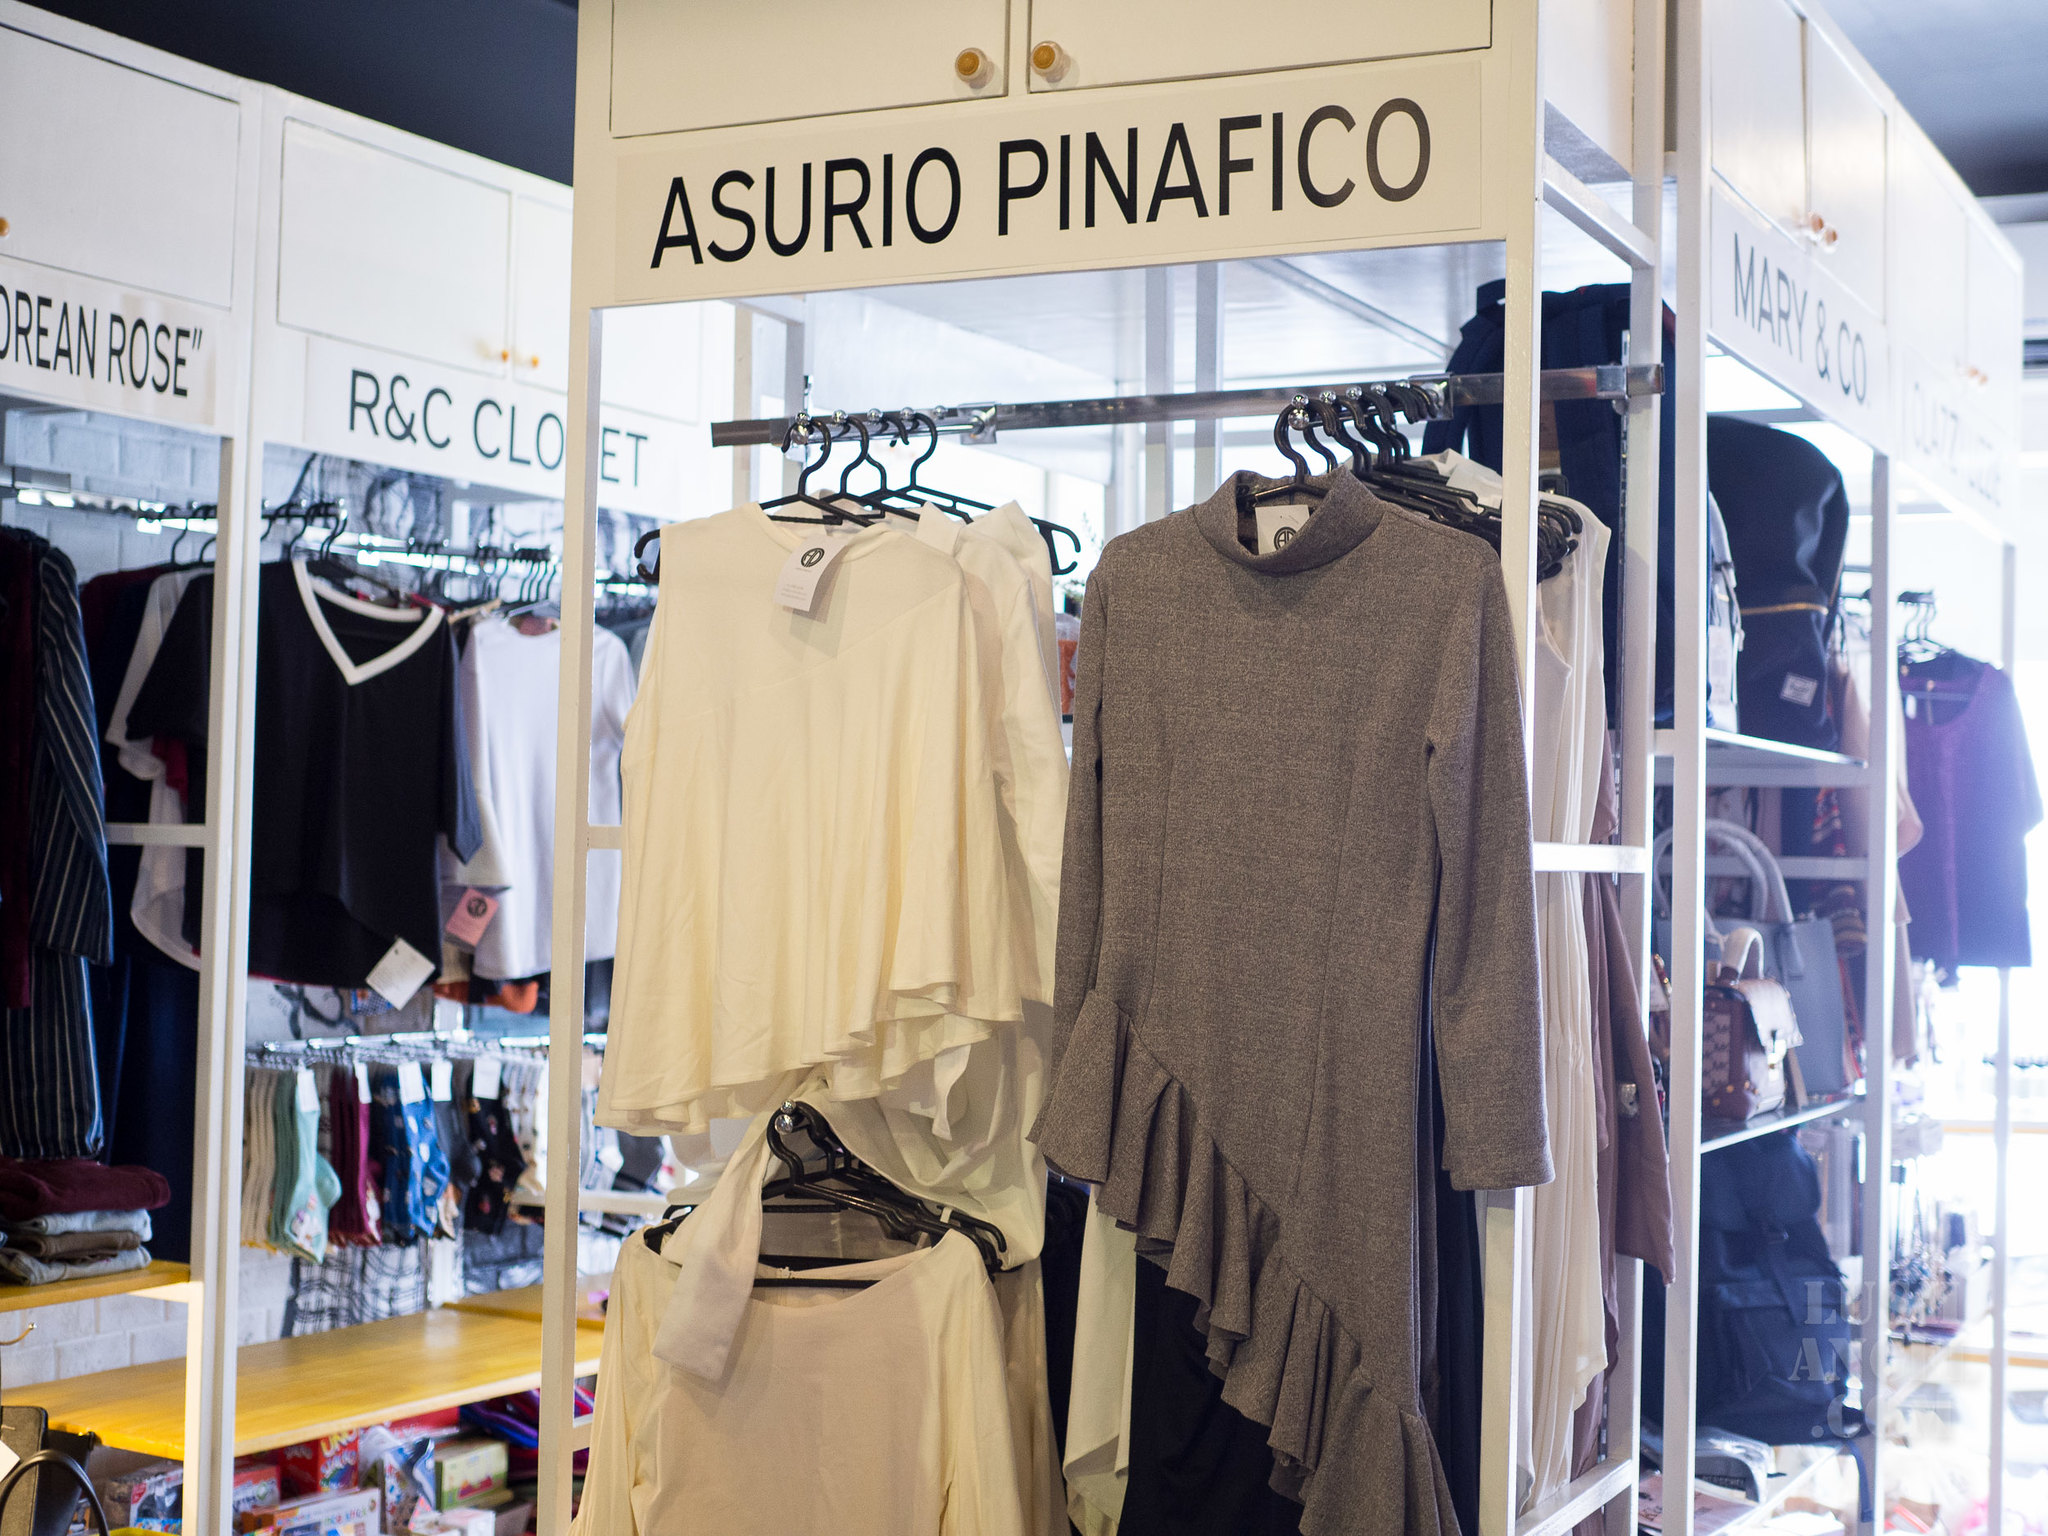 asurio-pinafico